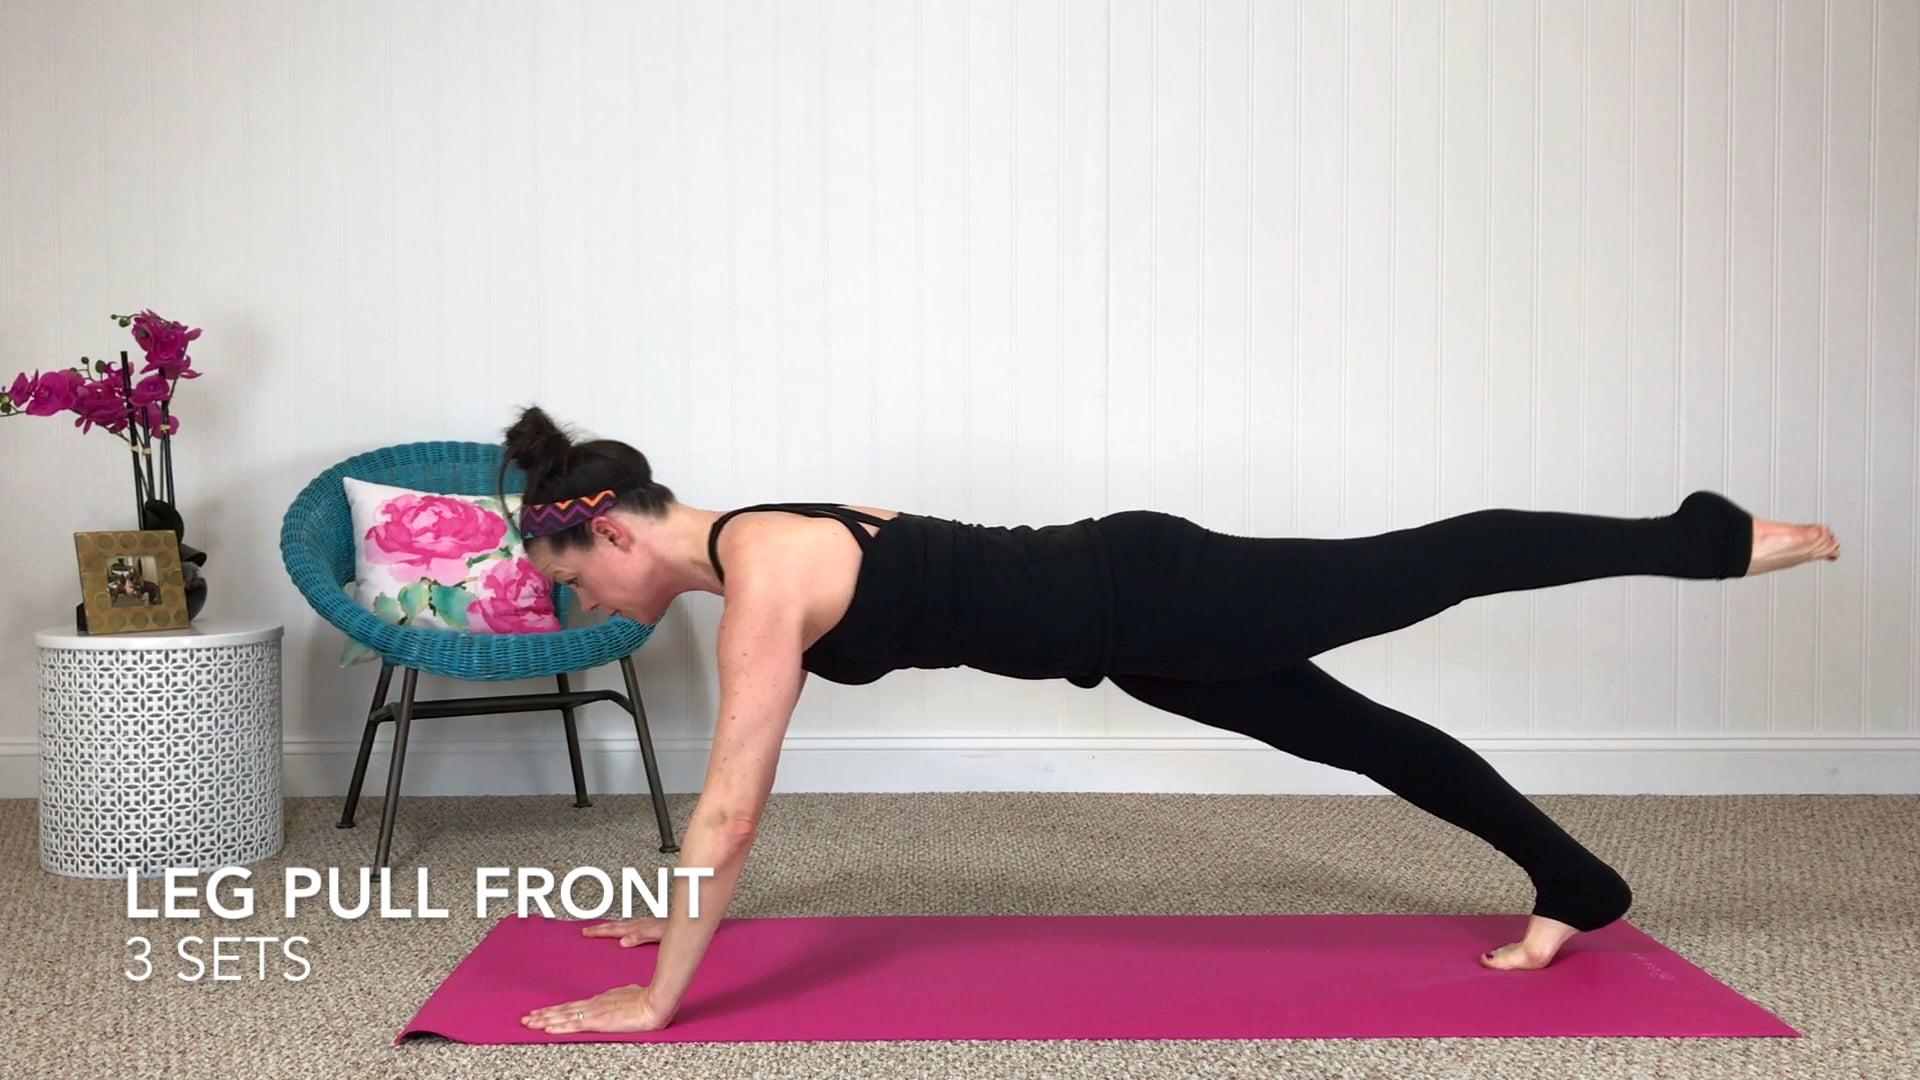 Leg Pull Front